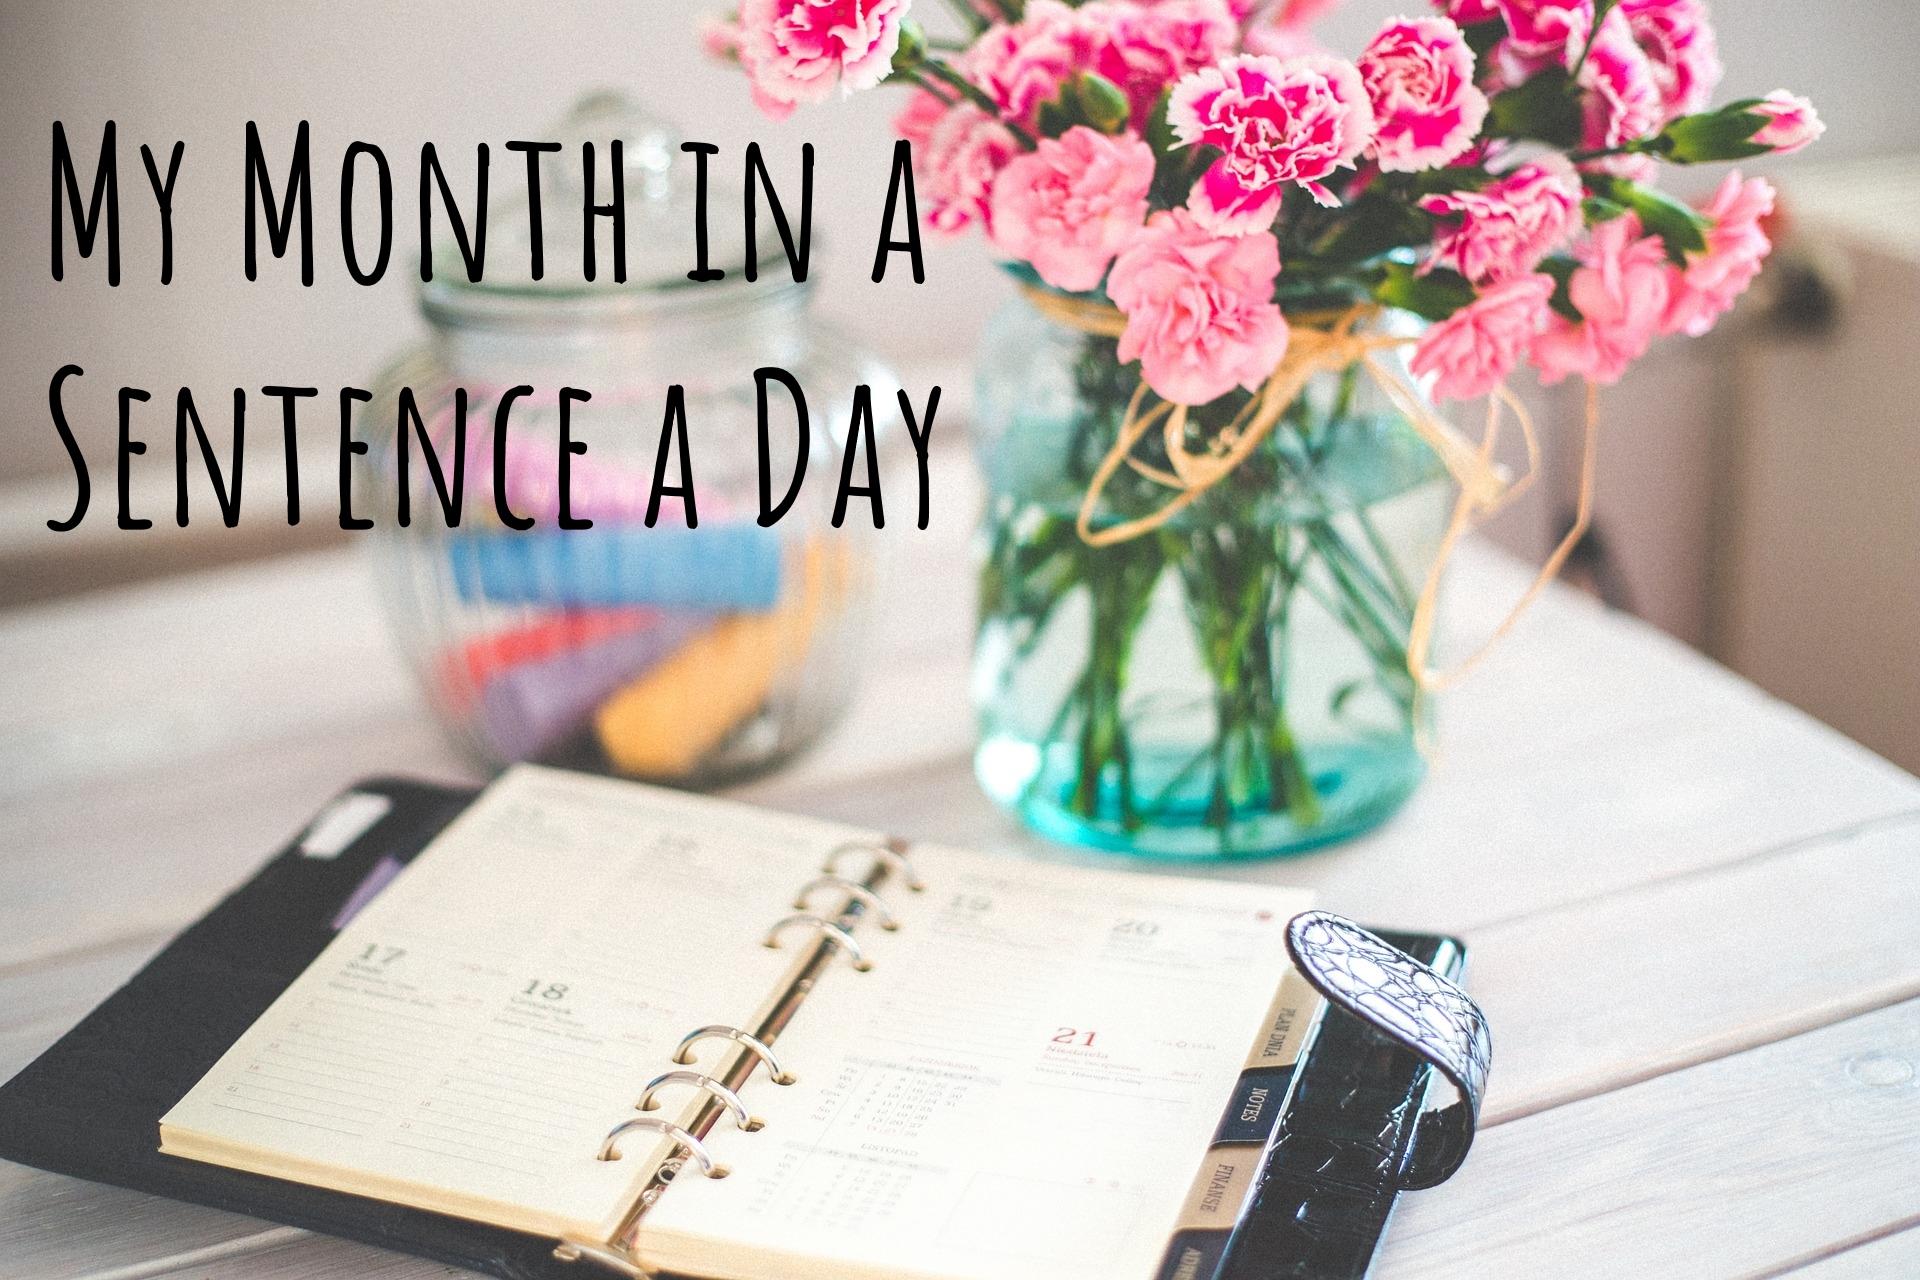 sentence a day.jpg